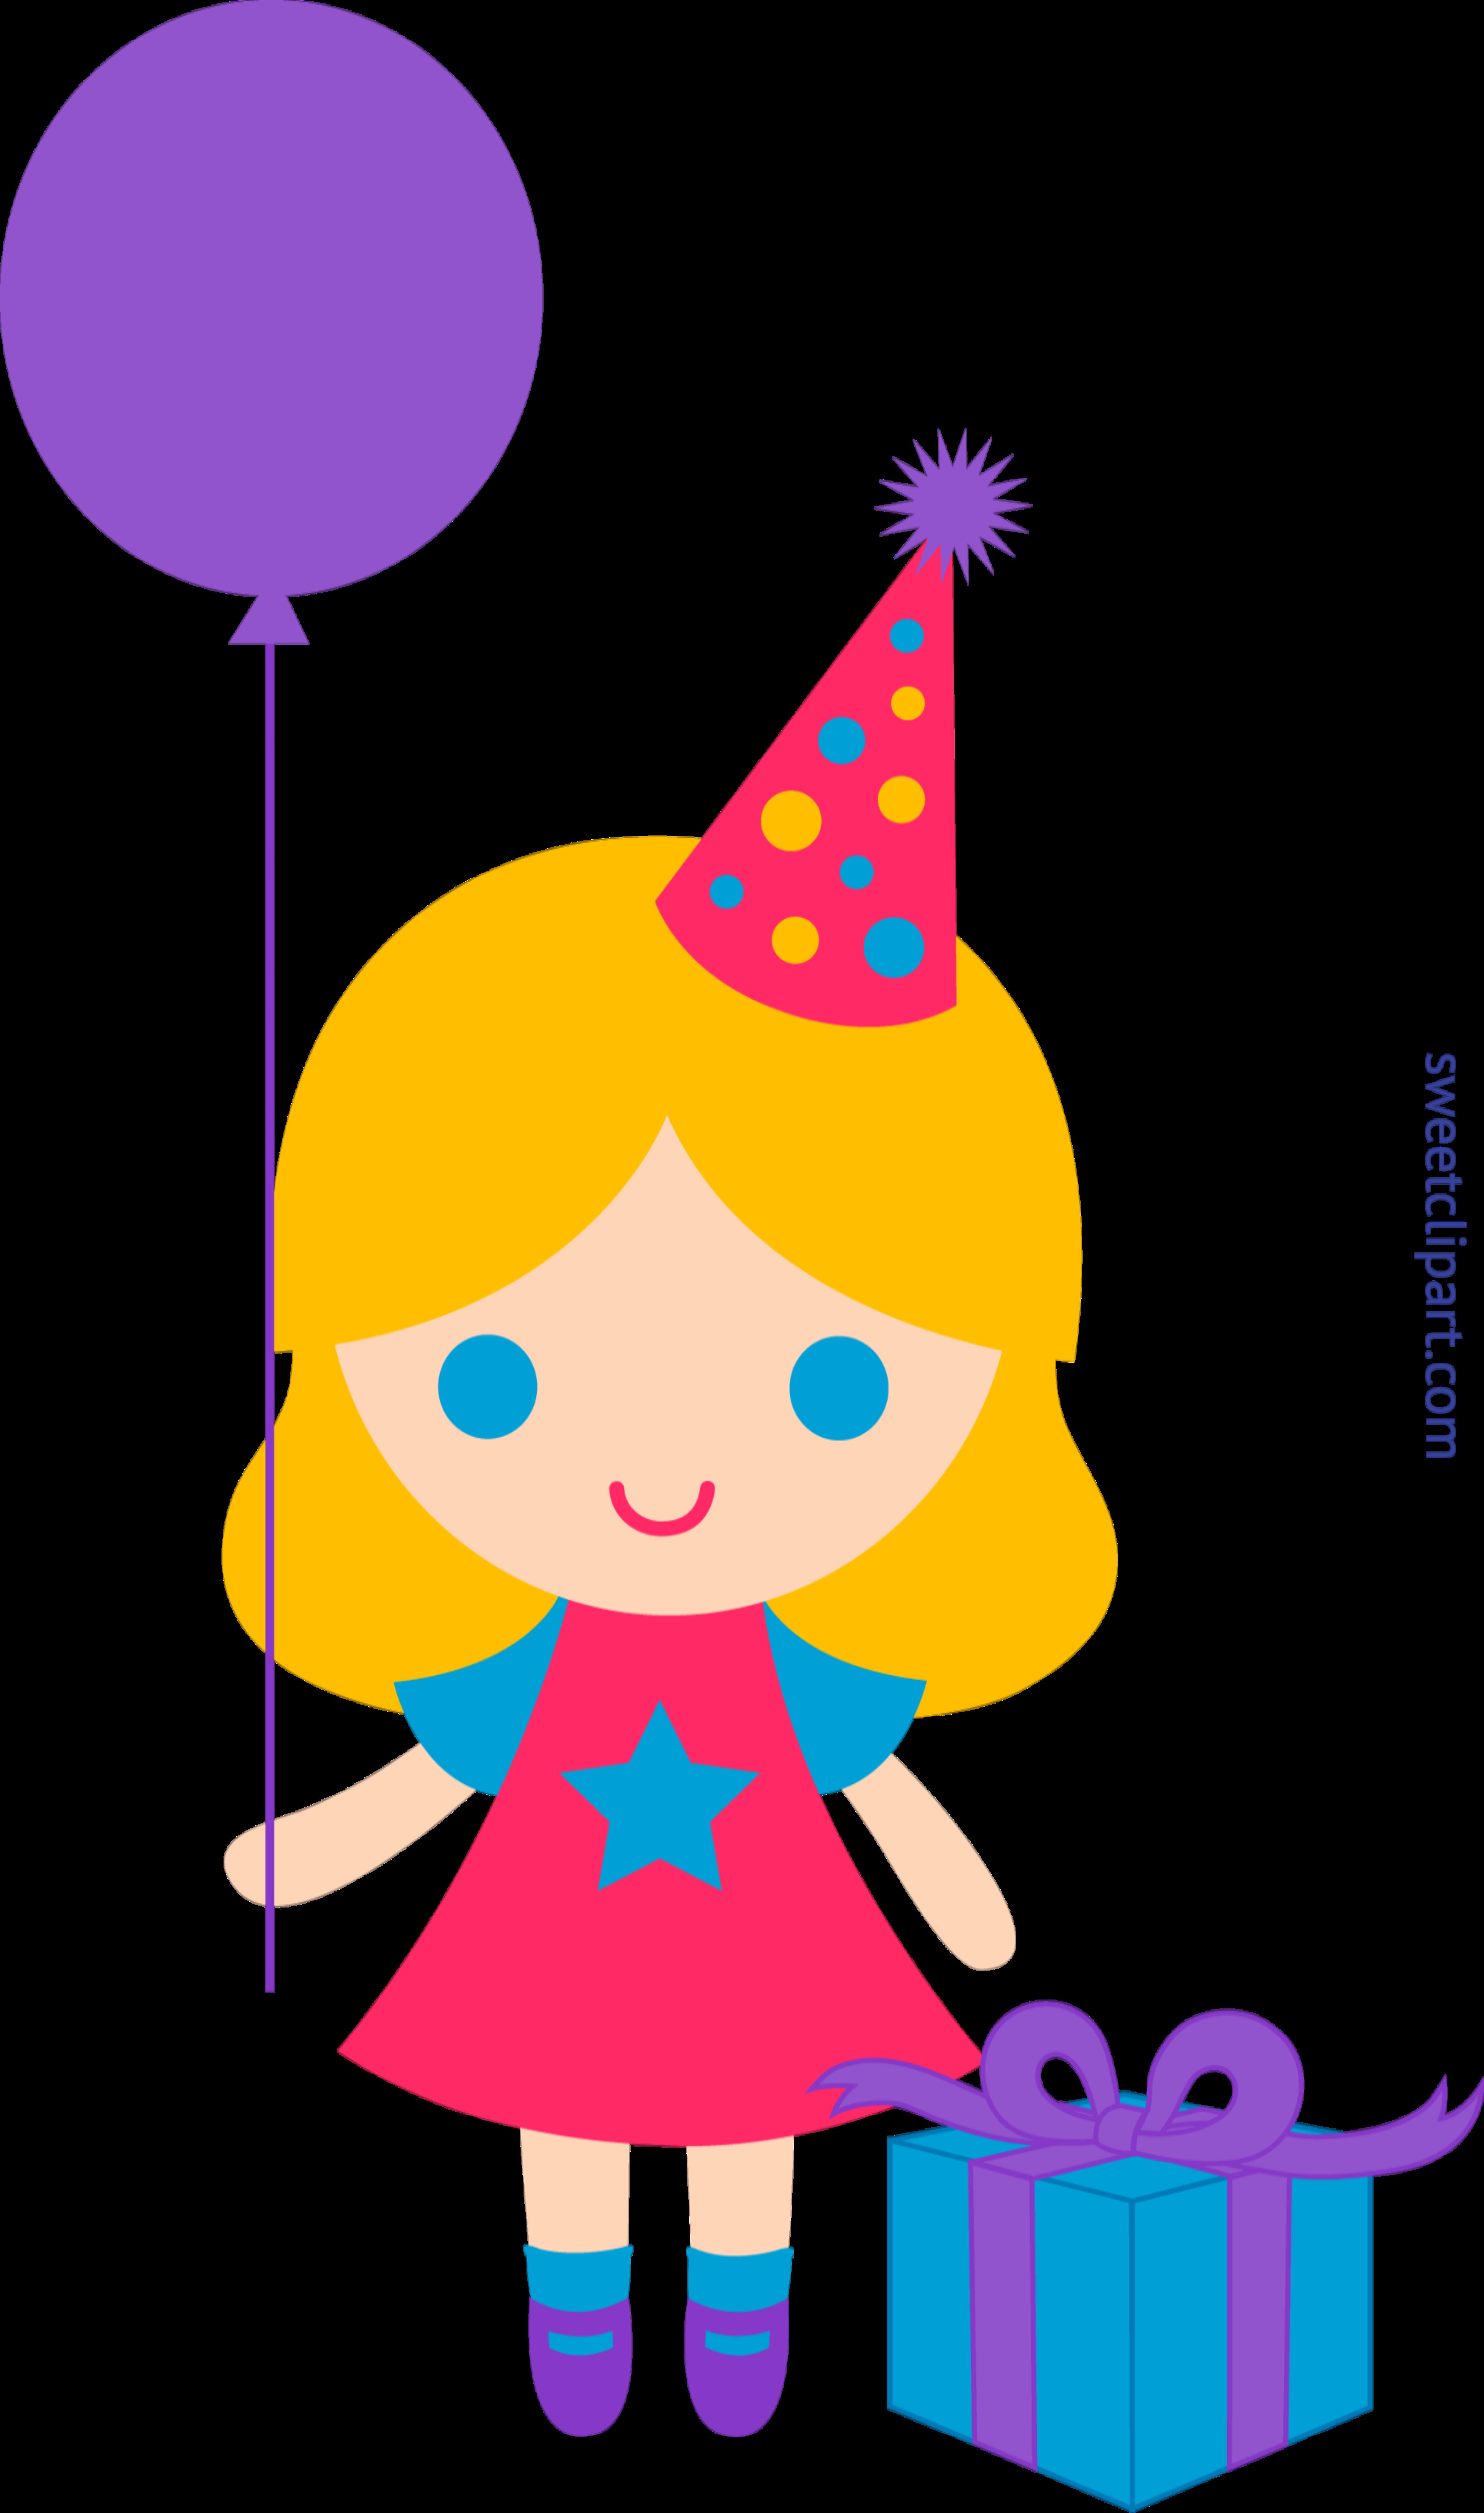 Birthday 2 with boy crown clipart jpg royalty free Birthday Girl Clip Art - Sweet Clip Art jpg royalty free